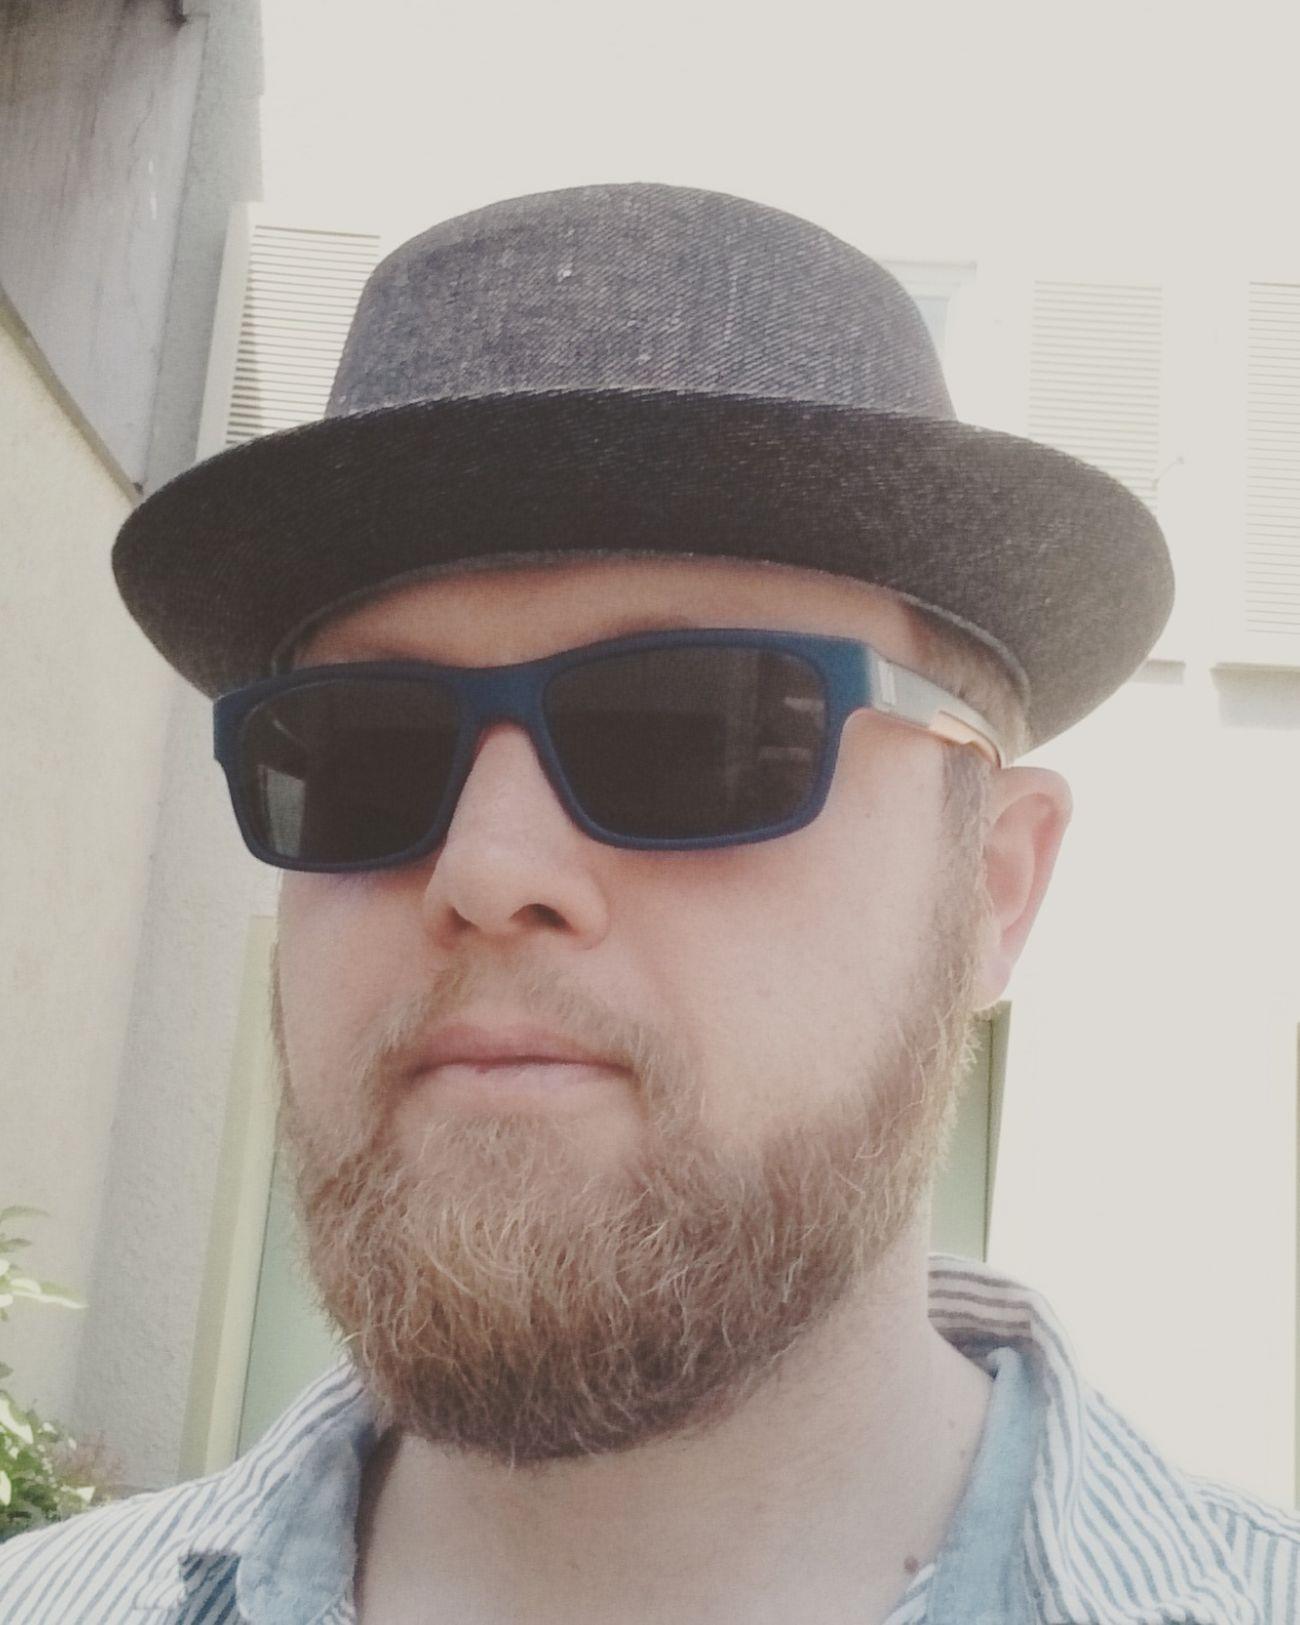 Mann mit Hut und Bart. Hut BART Bearded Porkpiehat Hat Sommer Beardbrand Beardbrandpotd Urbanbeardsman Beardbrand